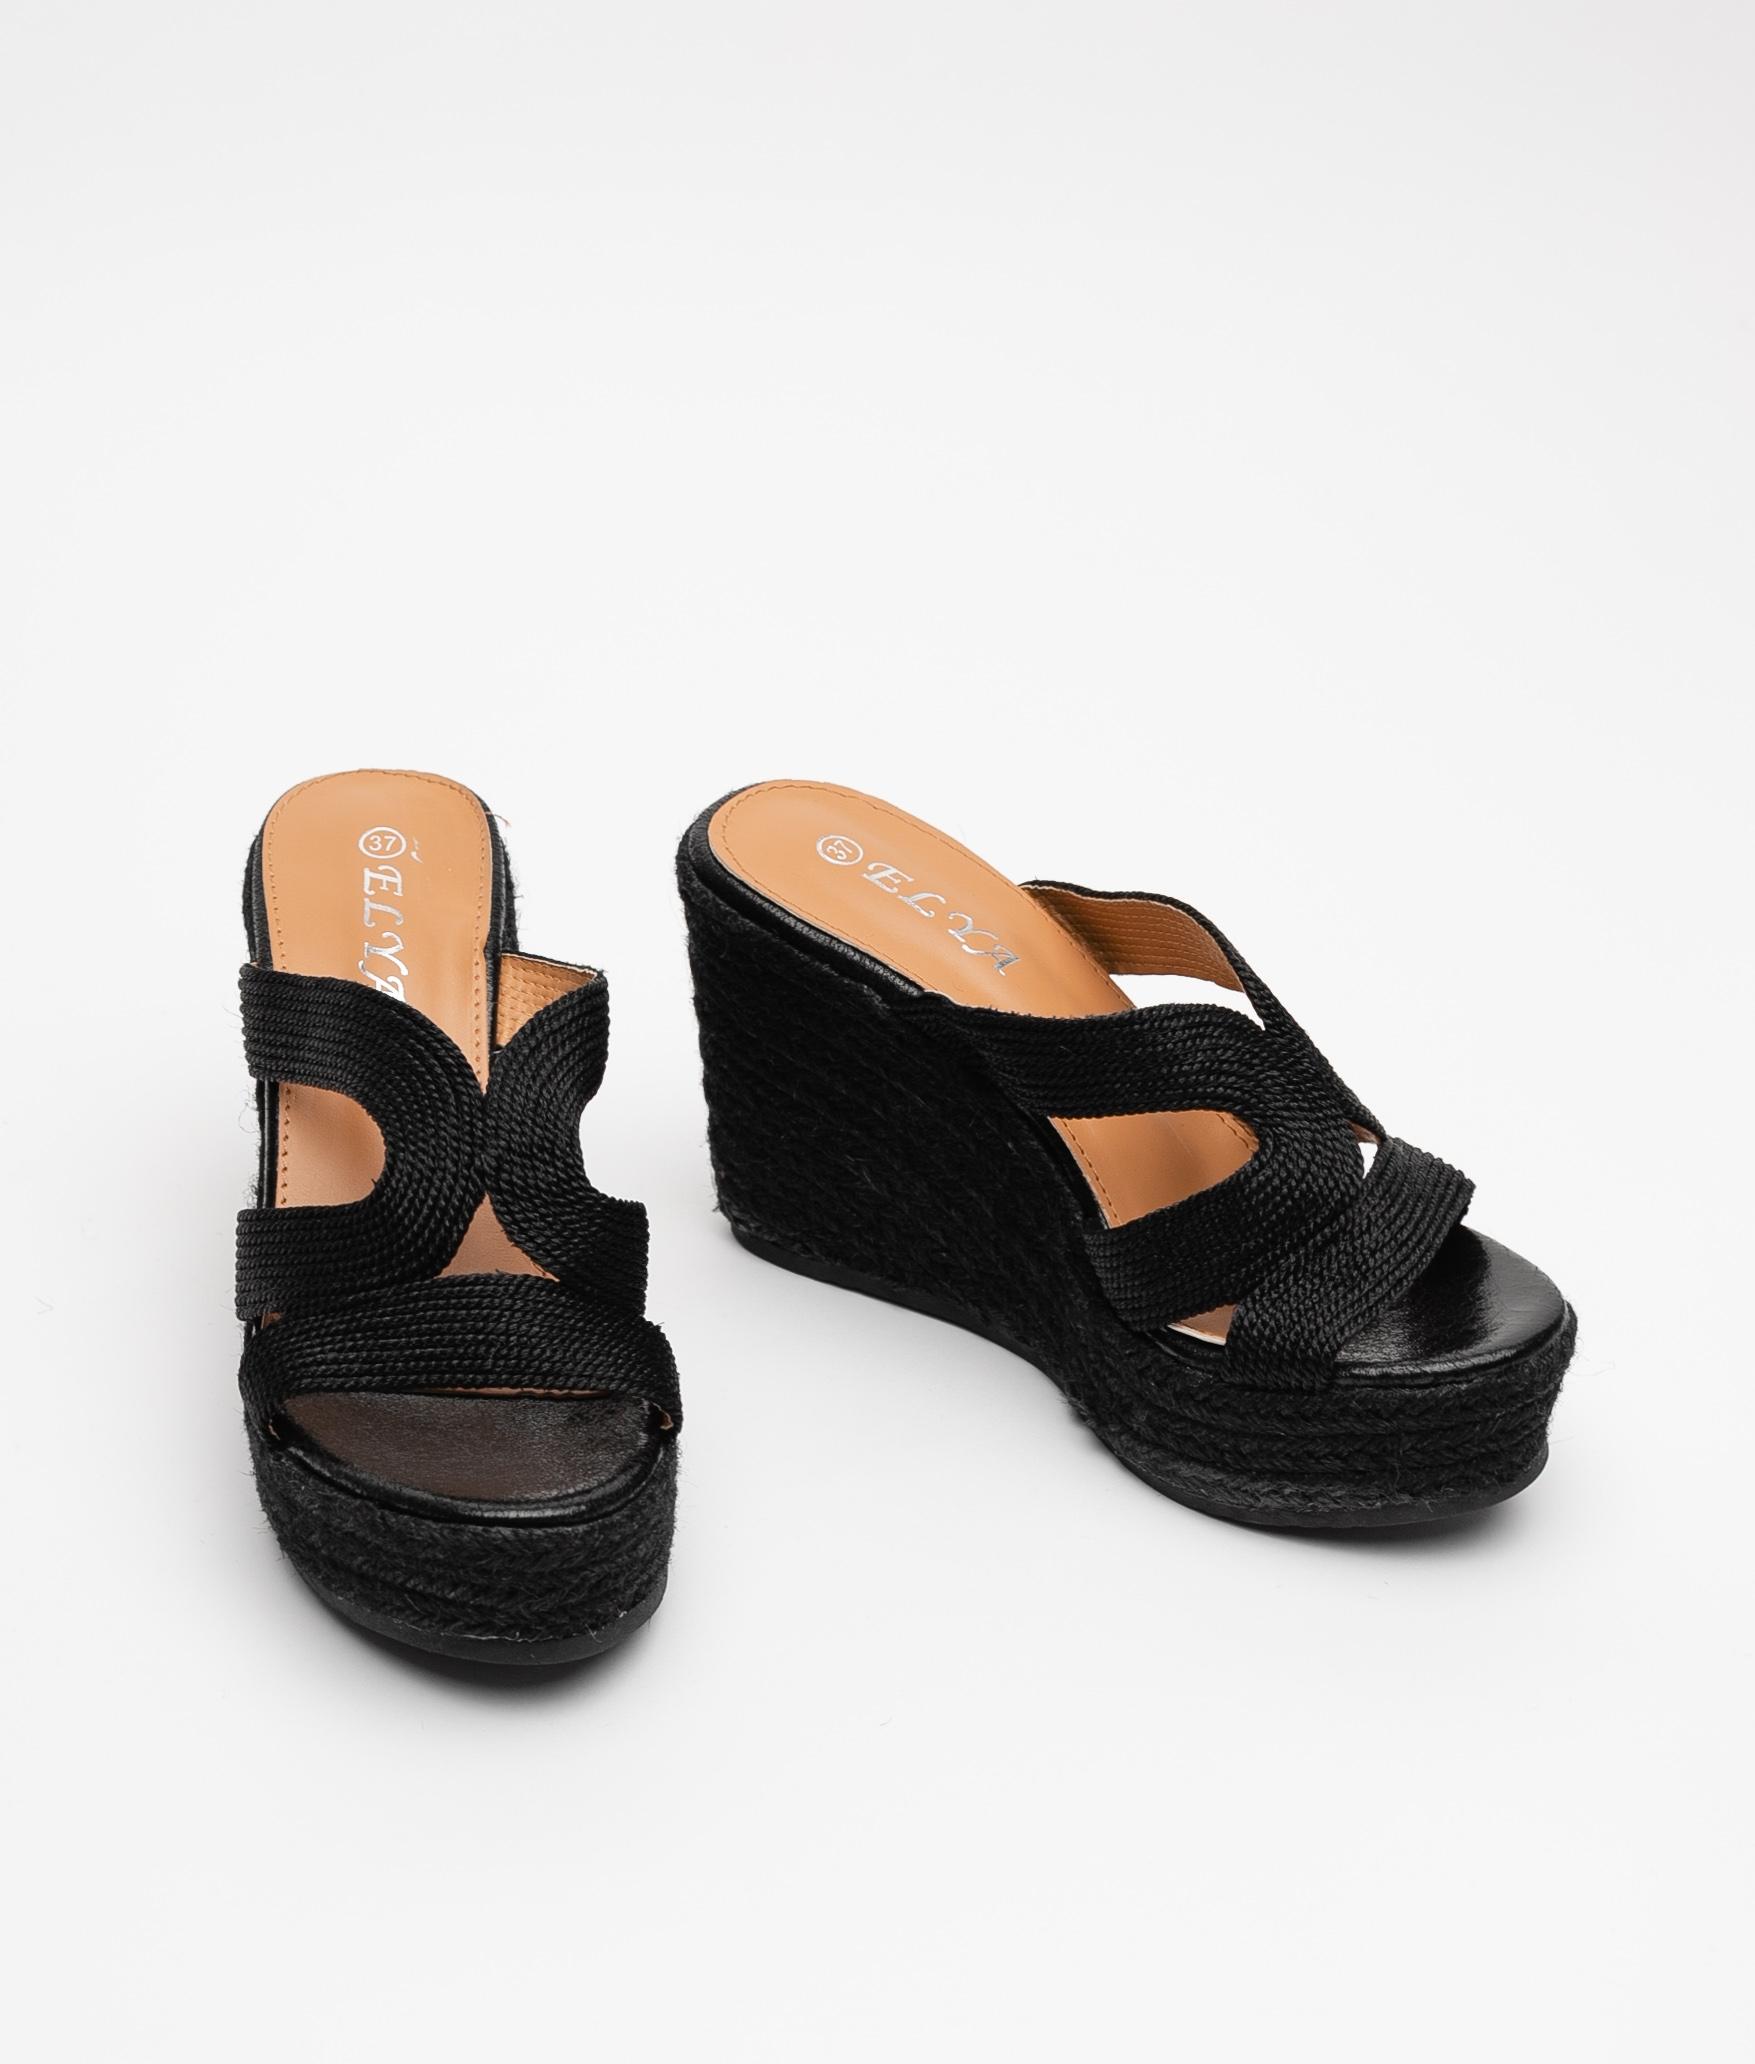 Wedge Heel Nila - Black